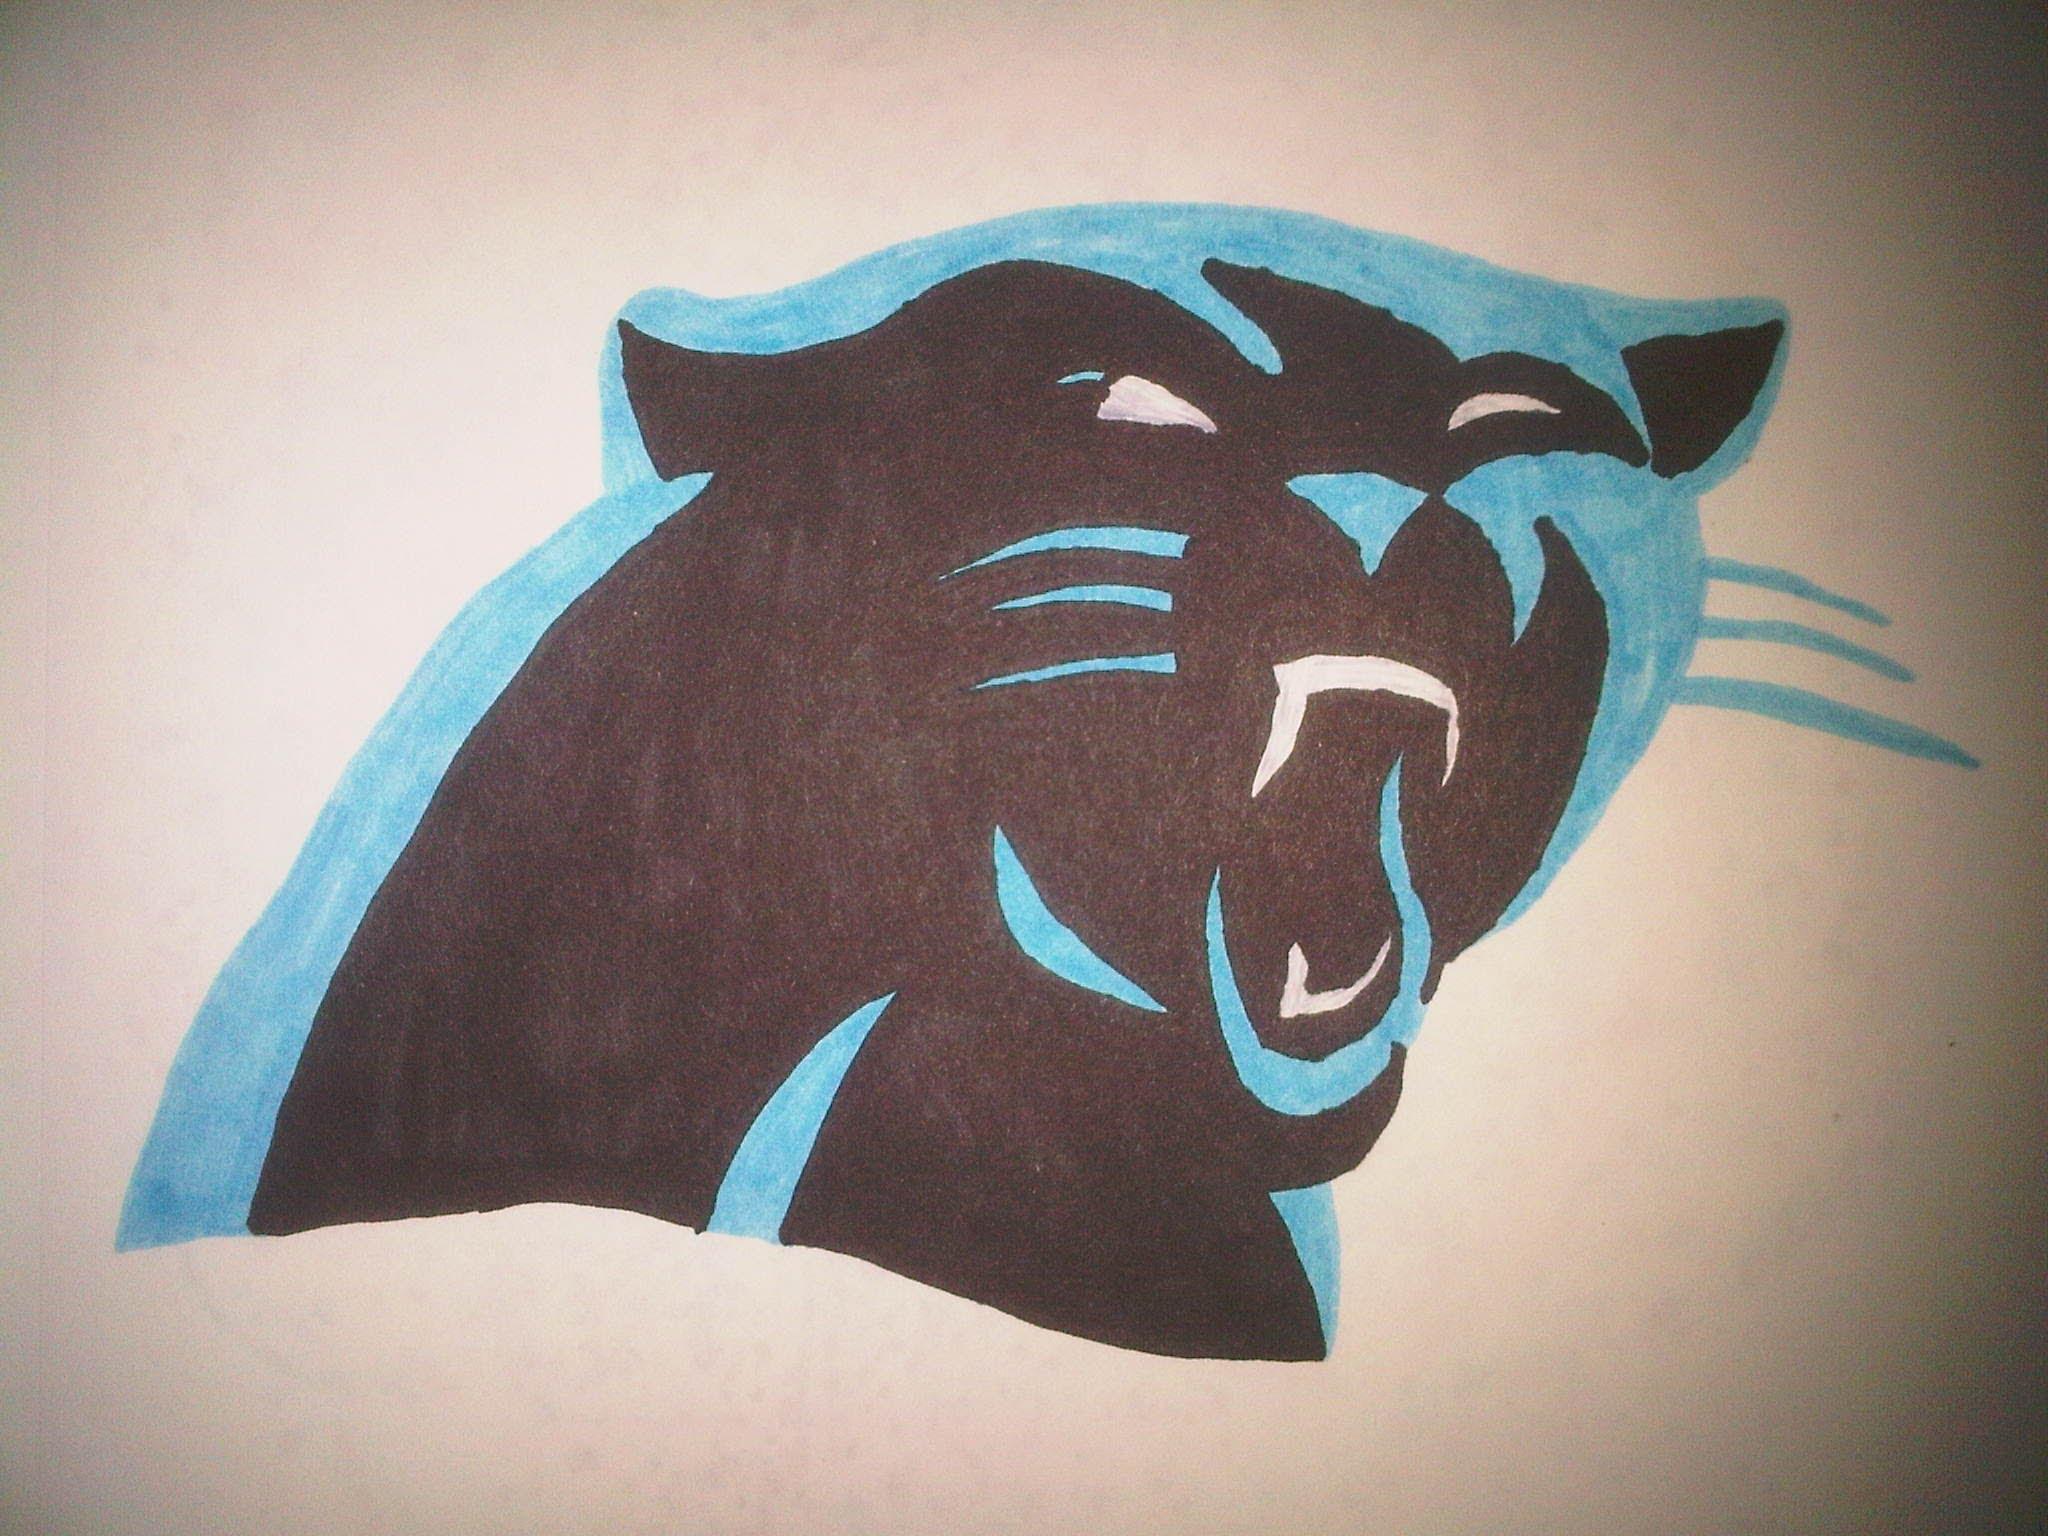 2048x1536 How To Draw The Carolina Panthers Logo